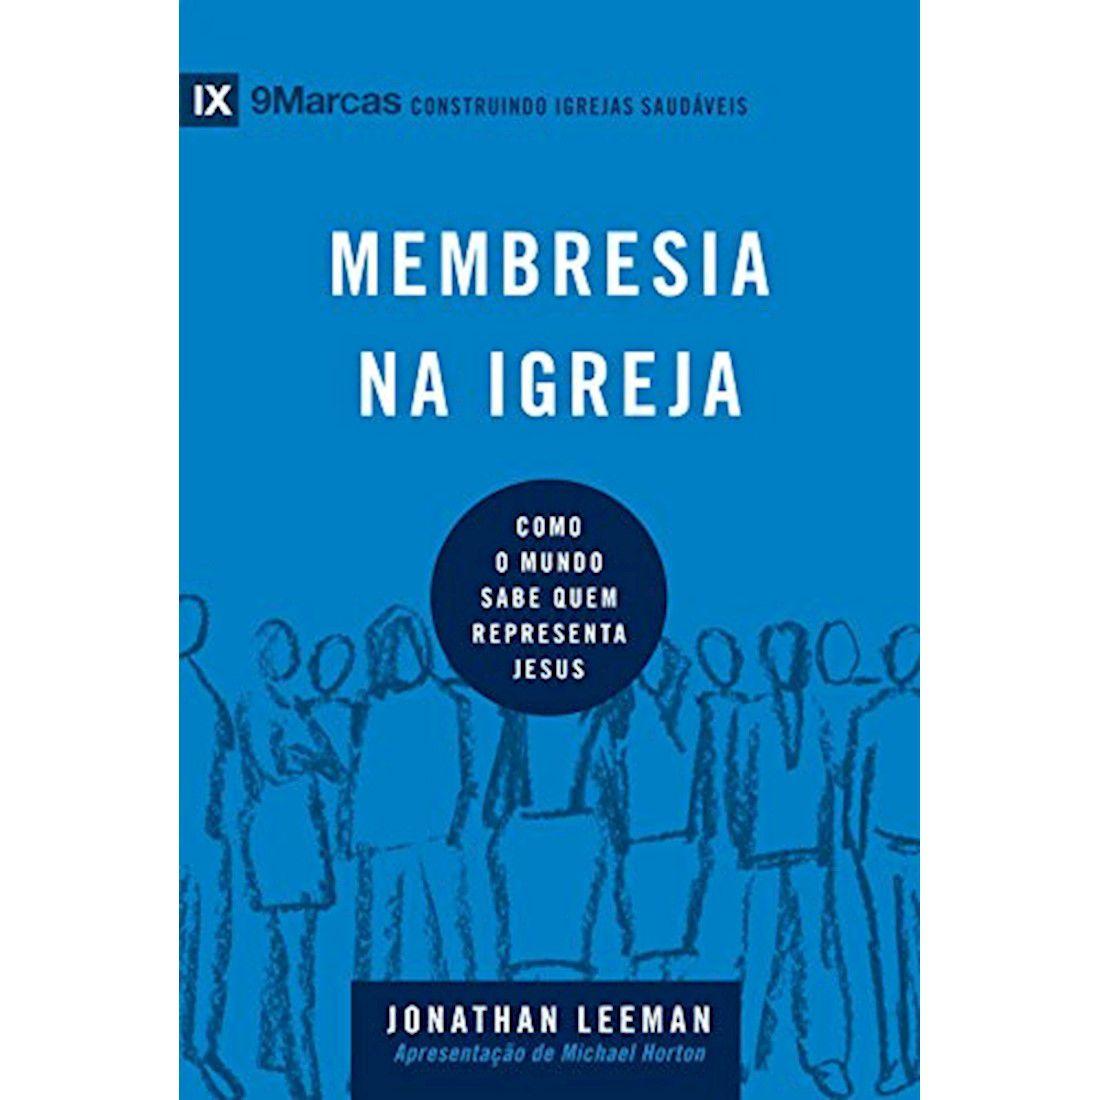 Livro Membresia na igreja - Série 9Marcas